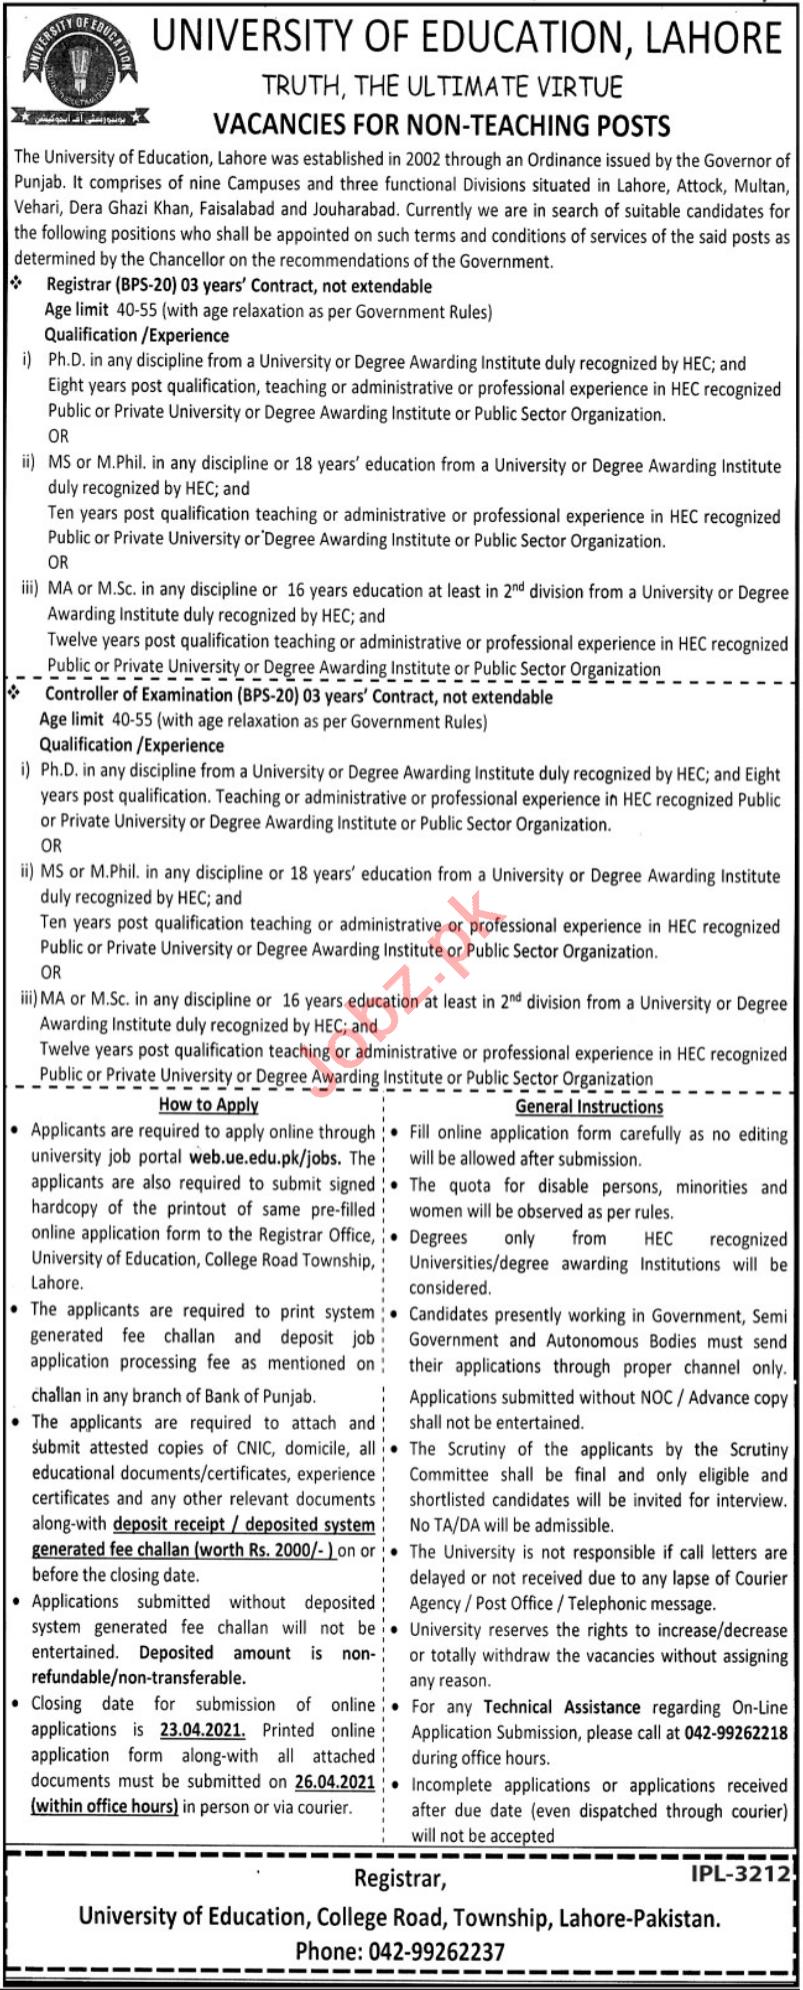 University of Education Lahore Jobs 2021 for Registrars